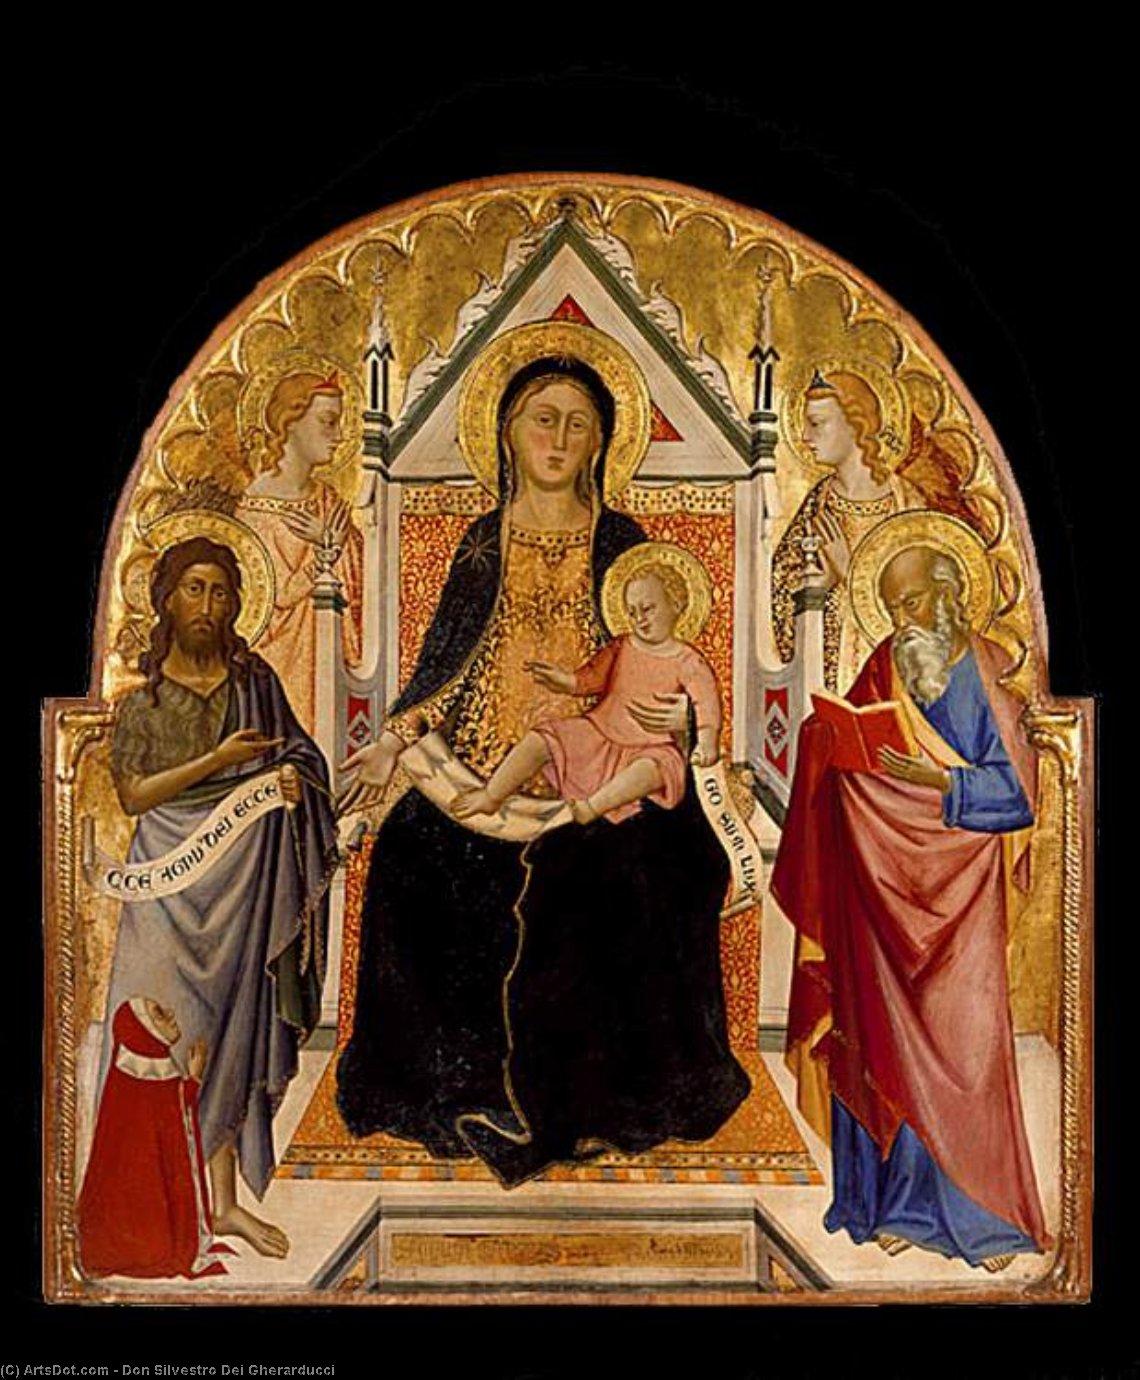 WikiOO.org - Enciklopedija dailės - Tapyba, meno kuriniai Don Silvestro Dei Gherarducci - Madonna and Child with Sts John Baptist and Paul